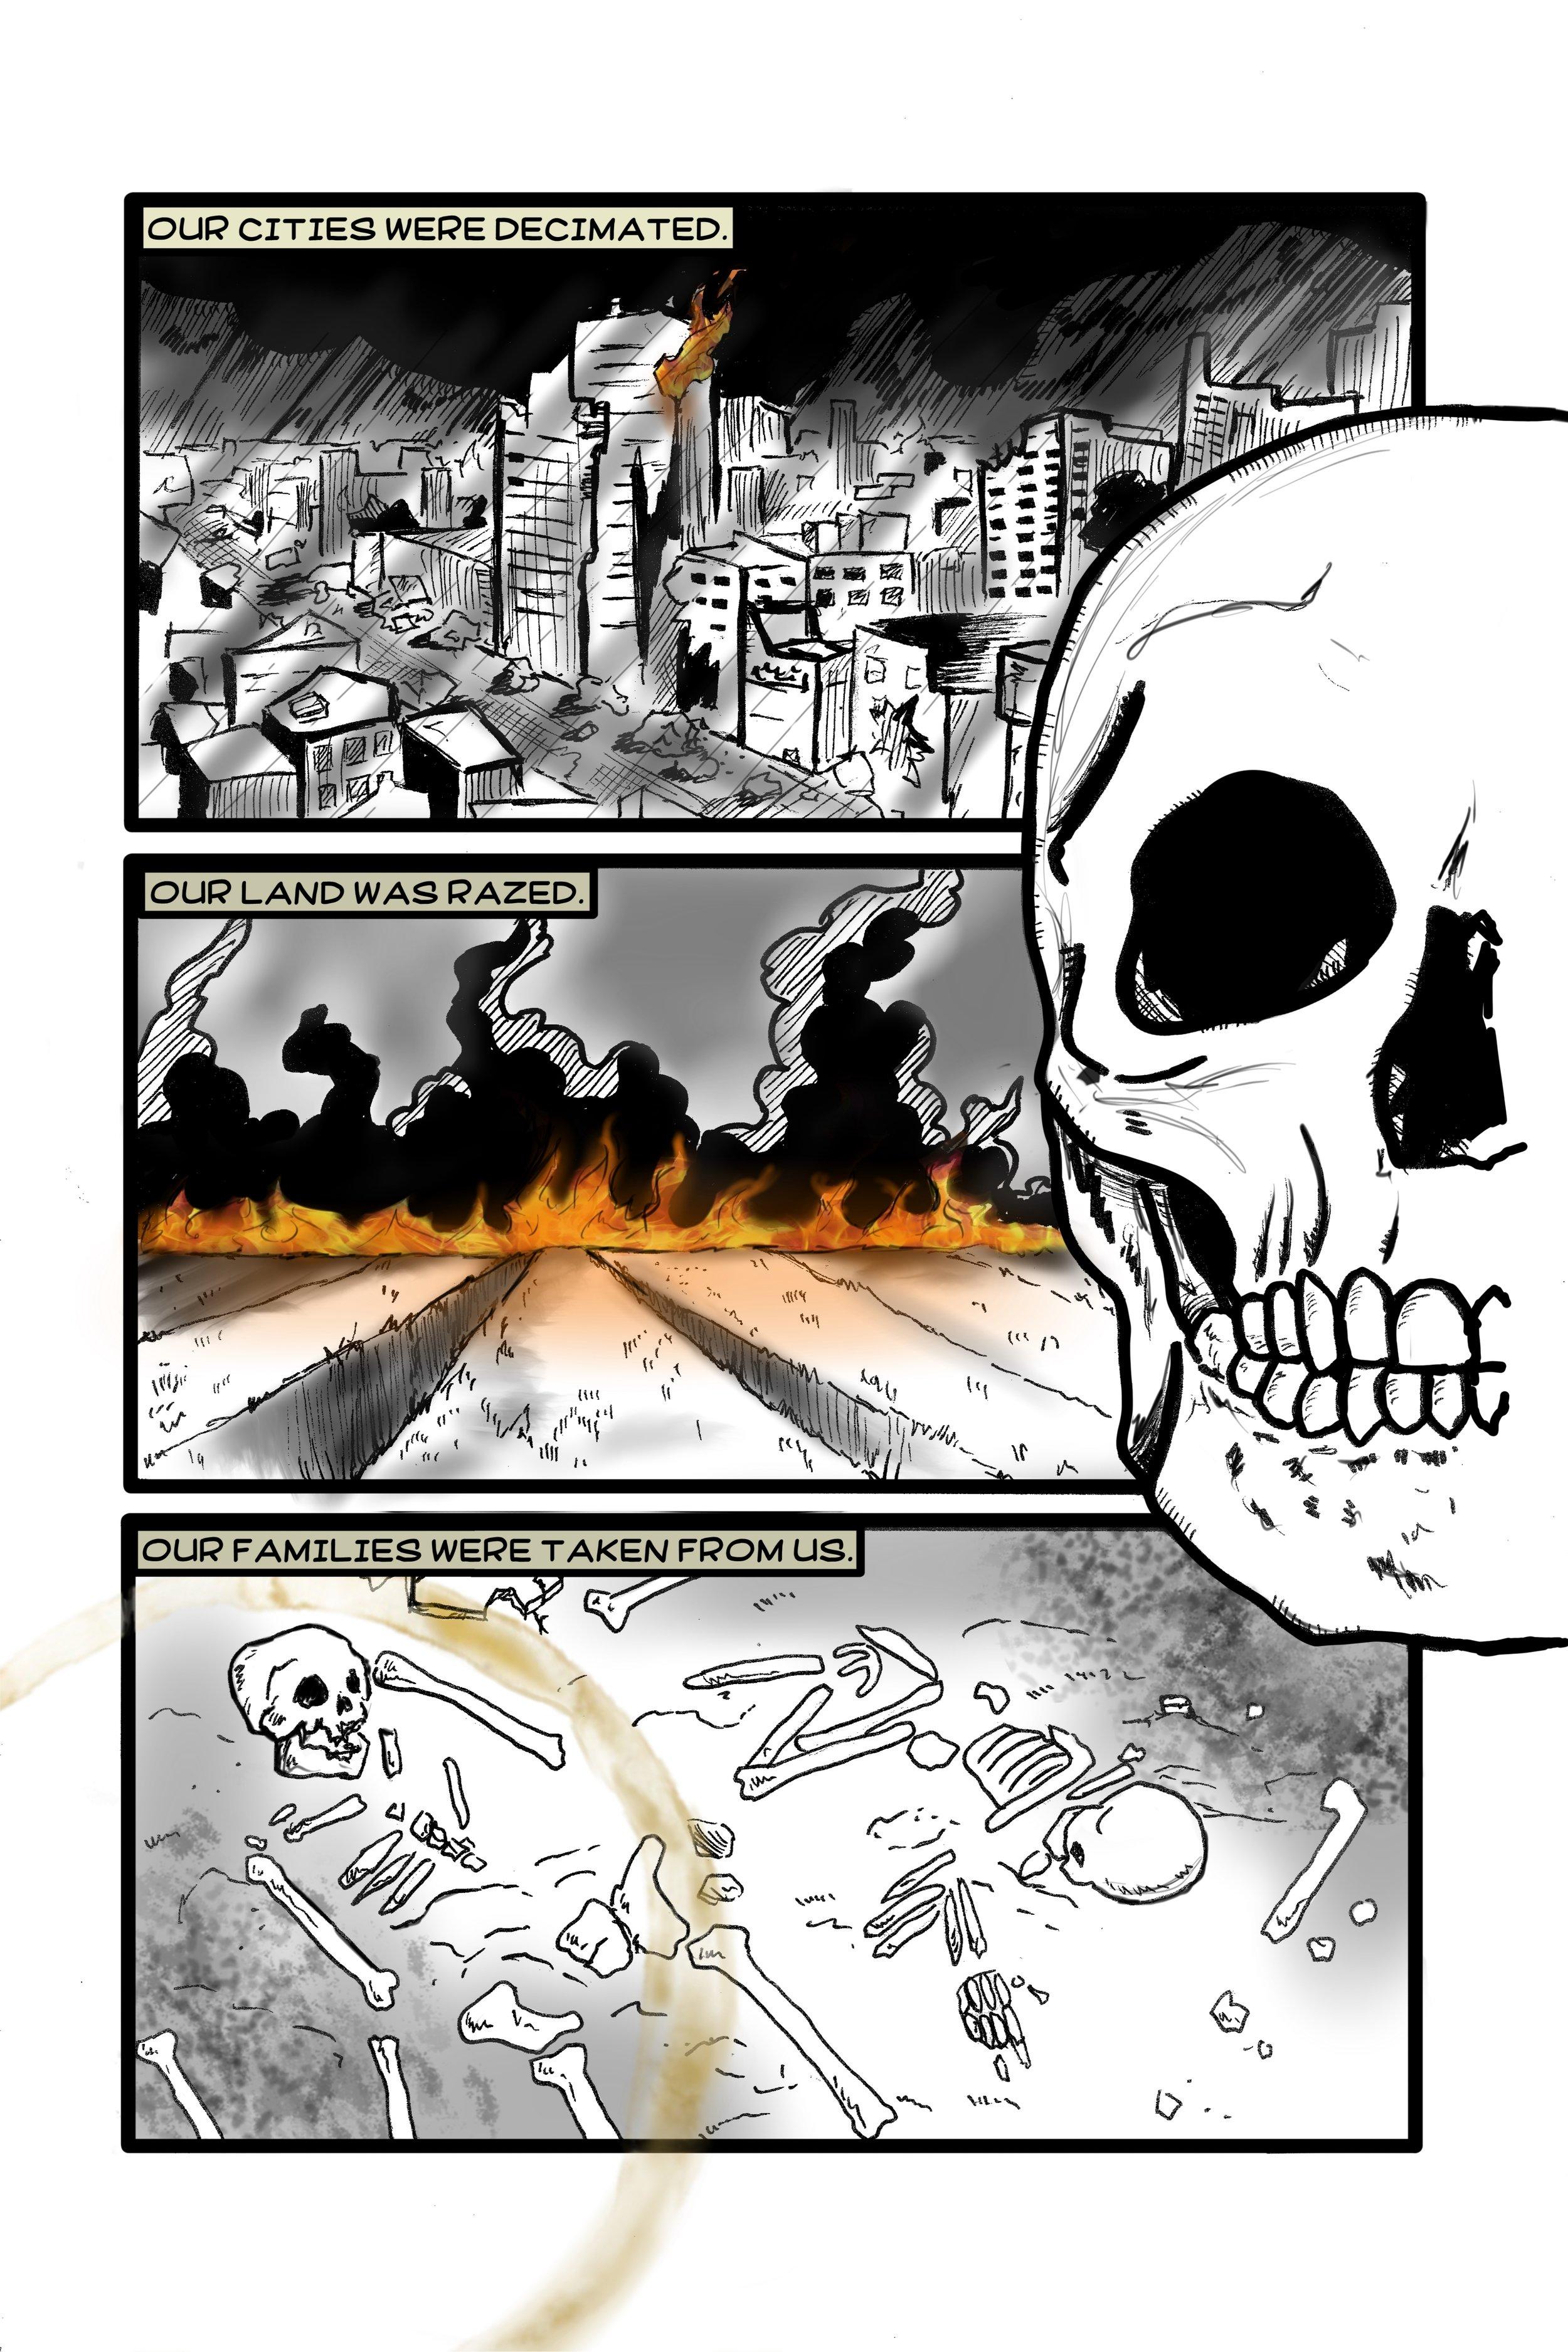 twh page3.jpg